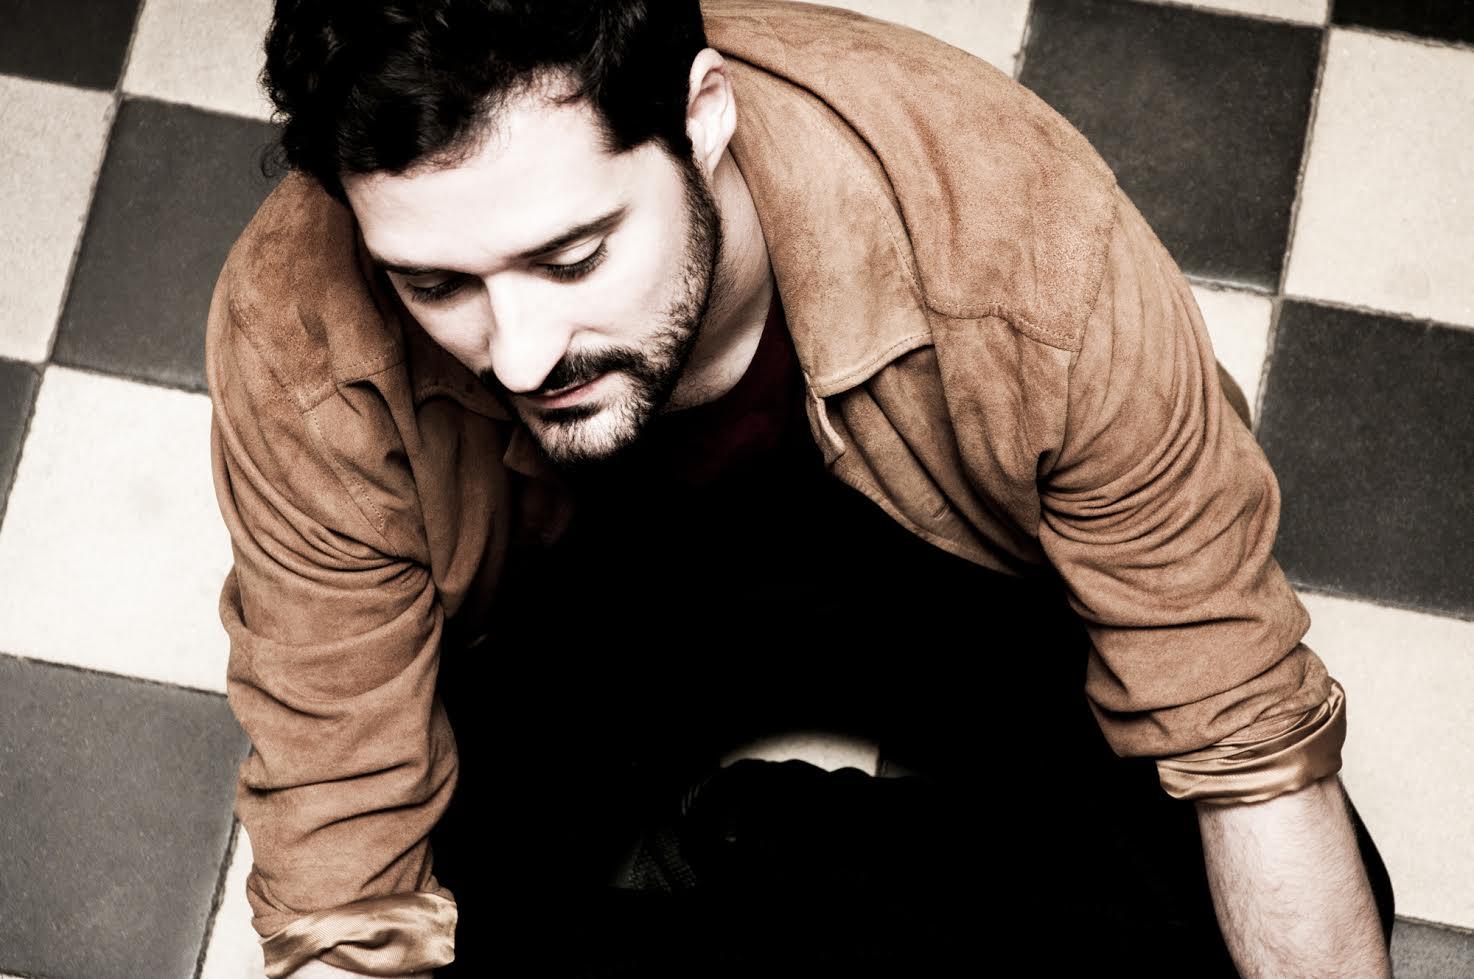 BLD aka Baldo, residente de The Loft [Razzmatazz] y artífice de BLD Tape Recordings.